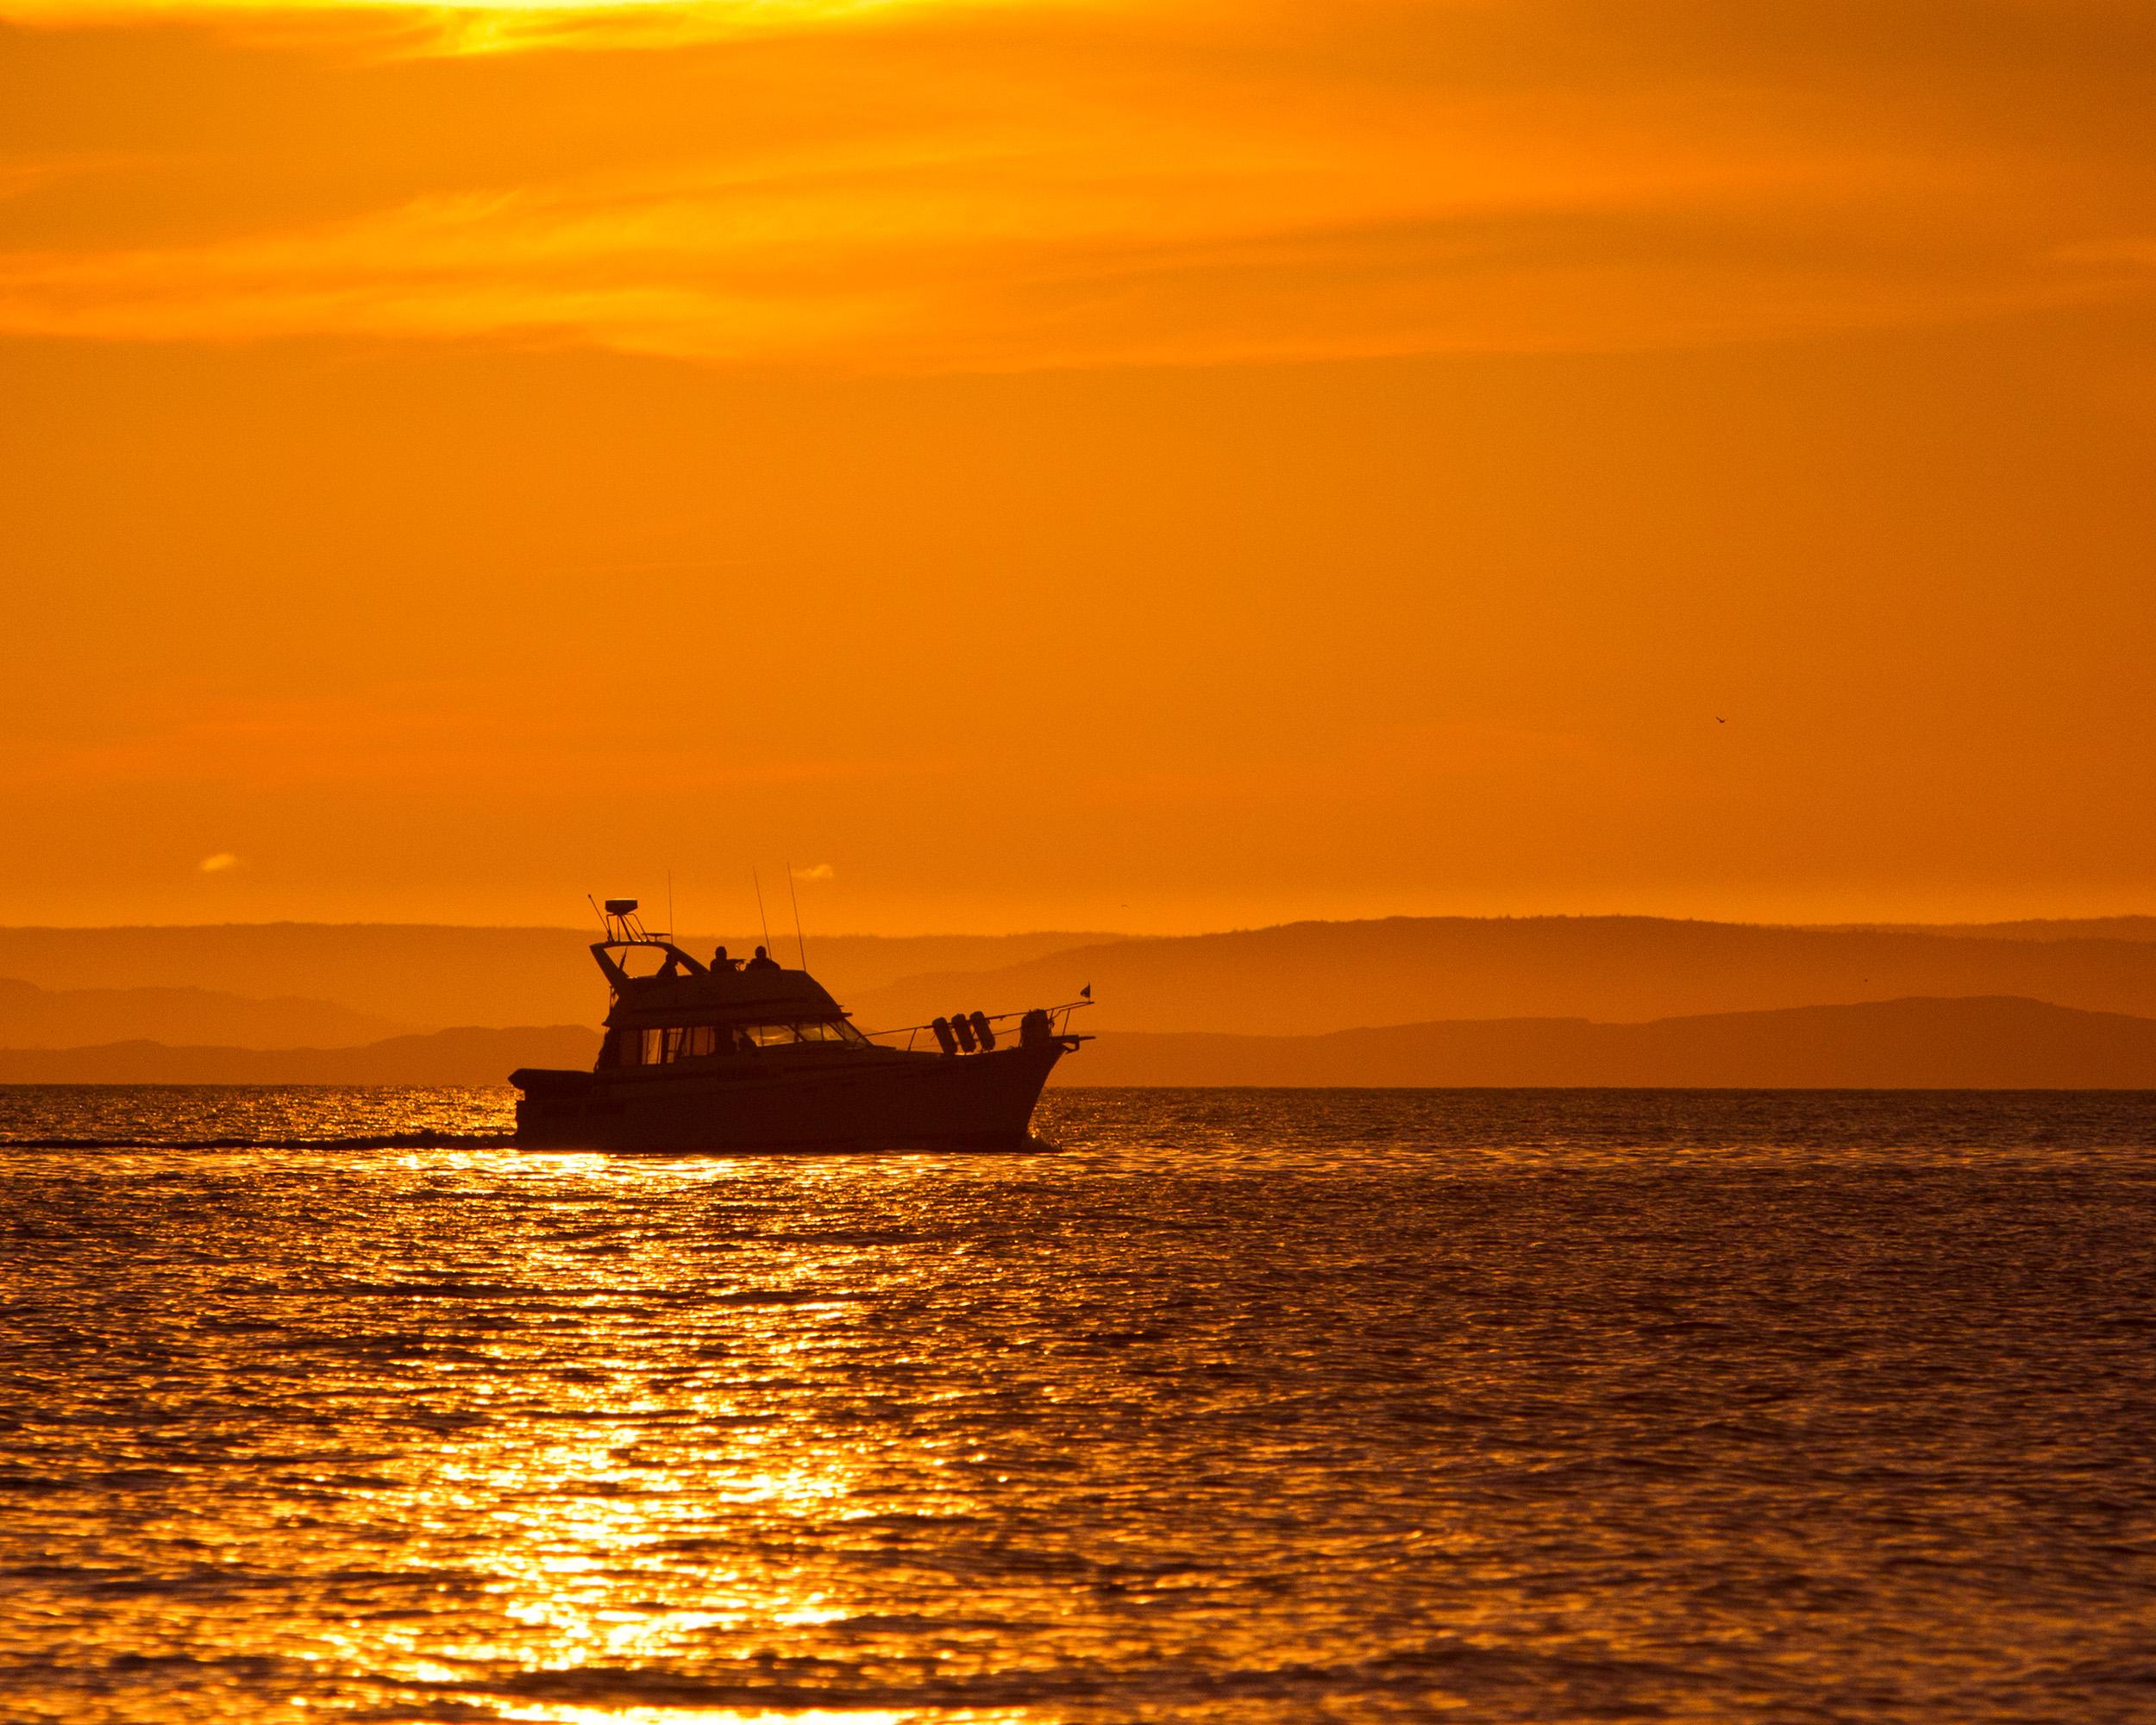 Boat at sunset, America, Sunset, Scenic, Sea, HQ Photo